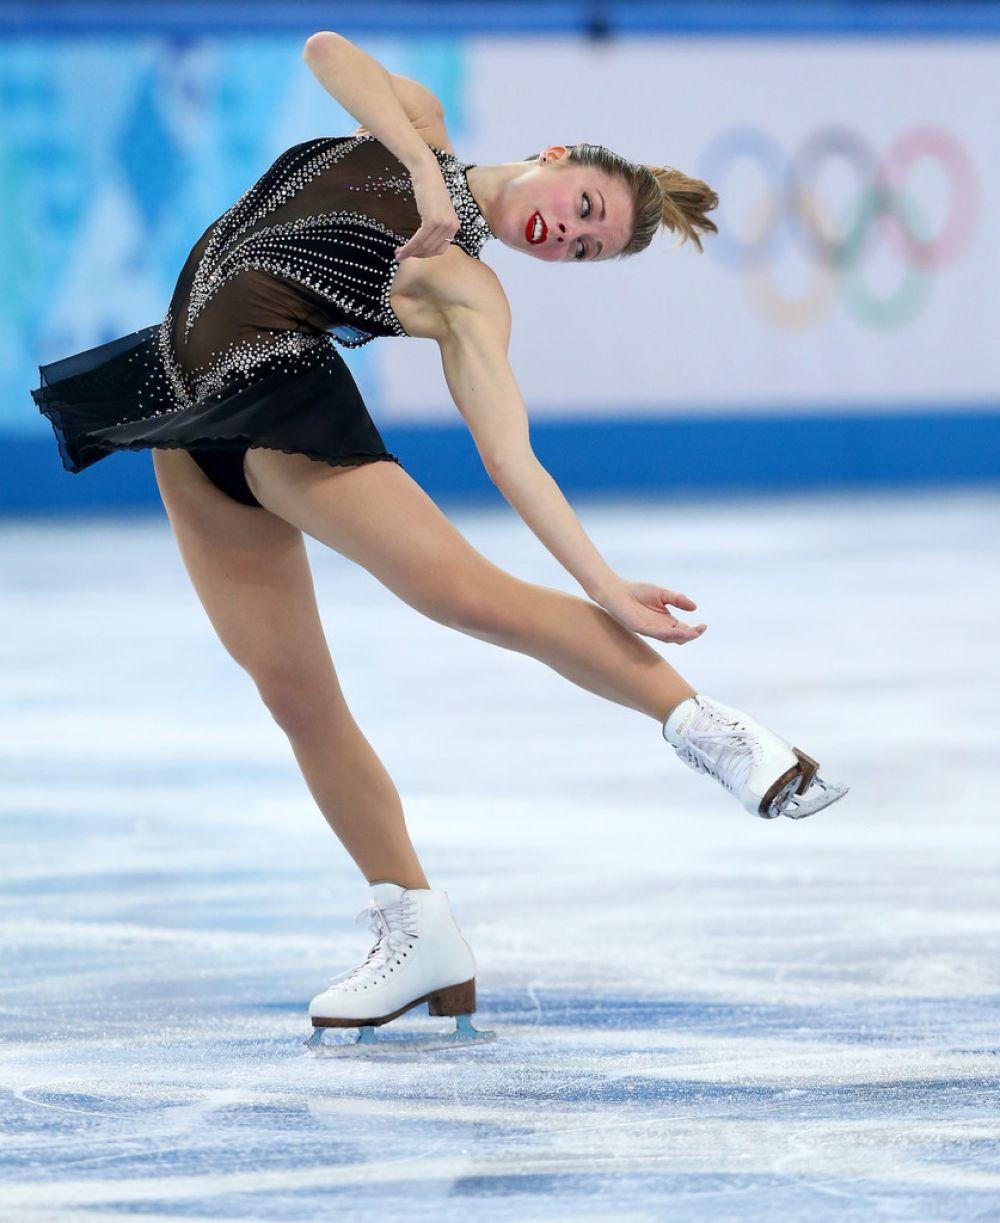 ASHLEY WAGNER at Figure Skating Ladies Short Program in Sochi